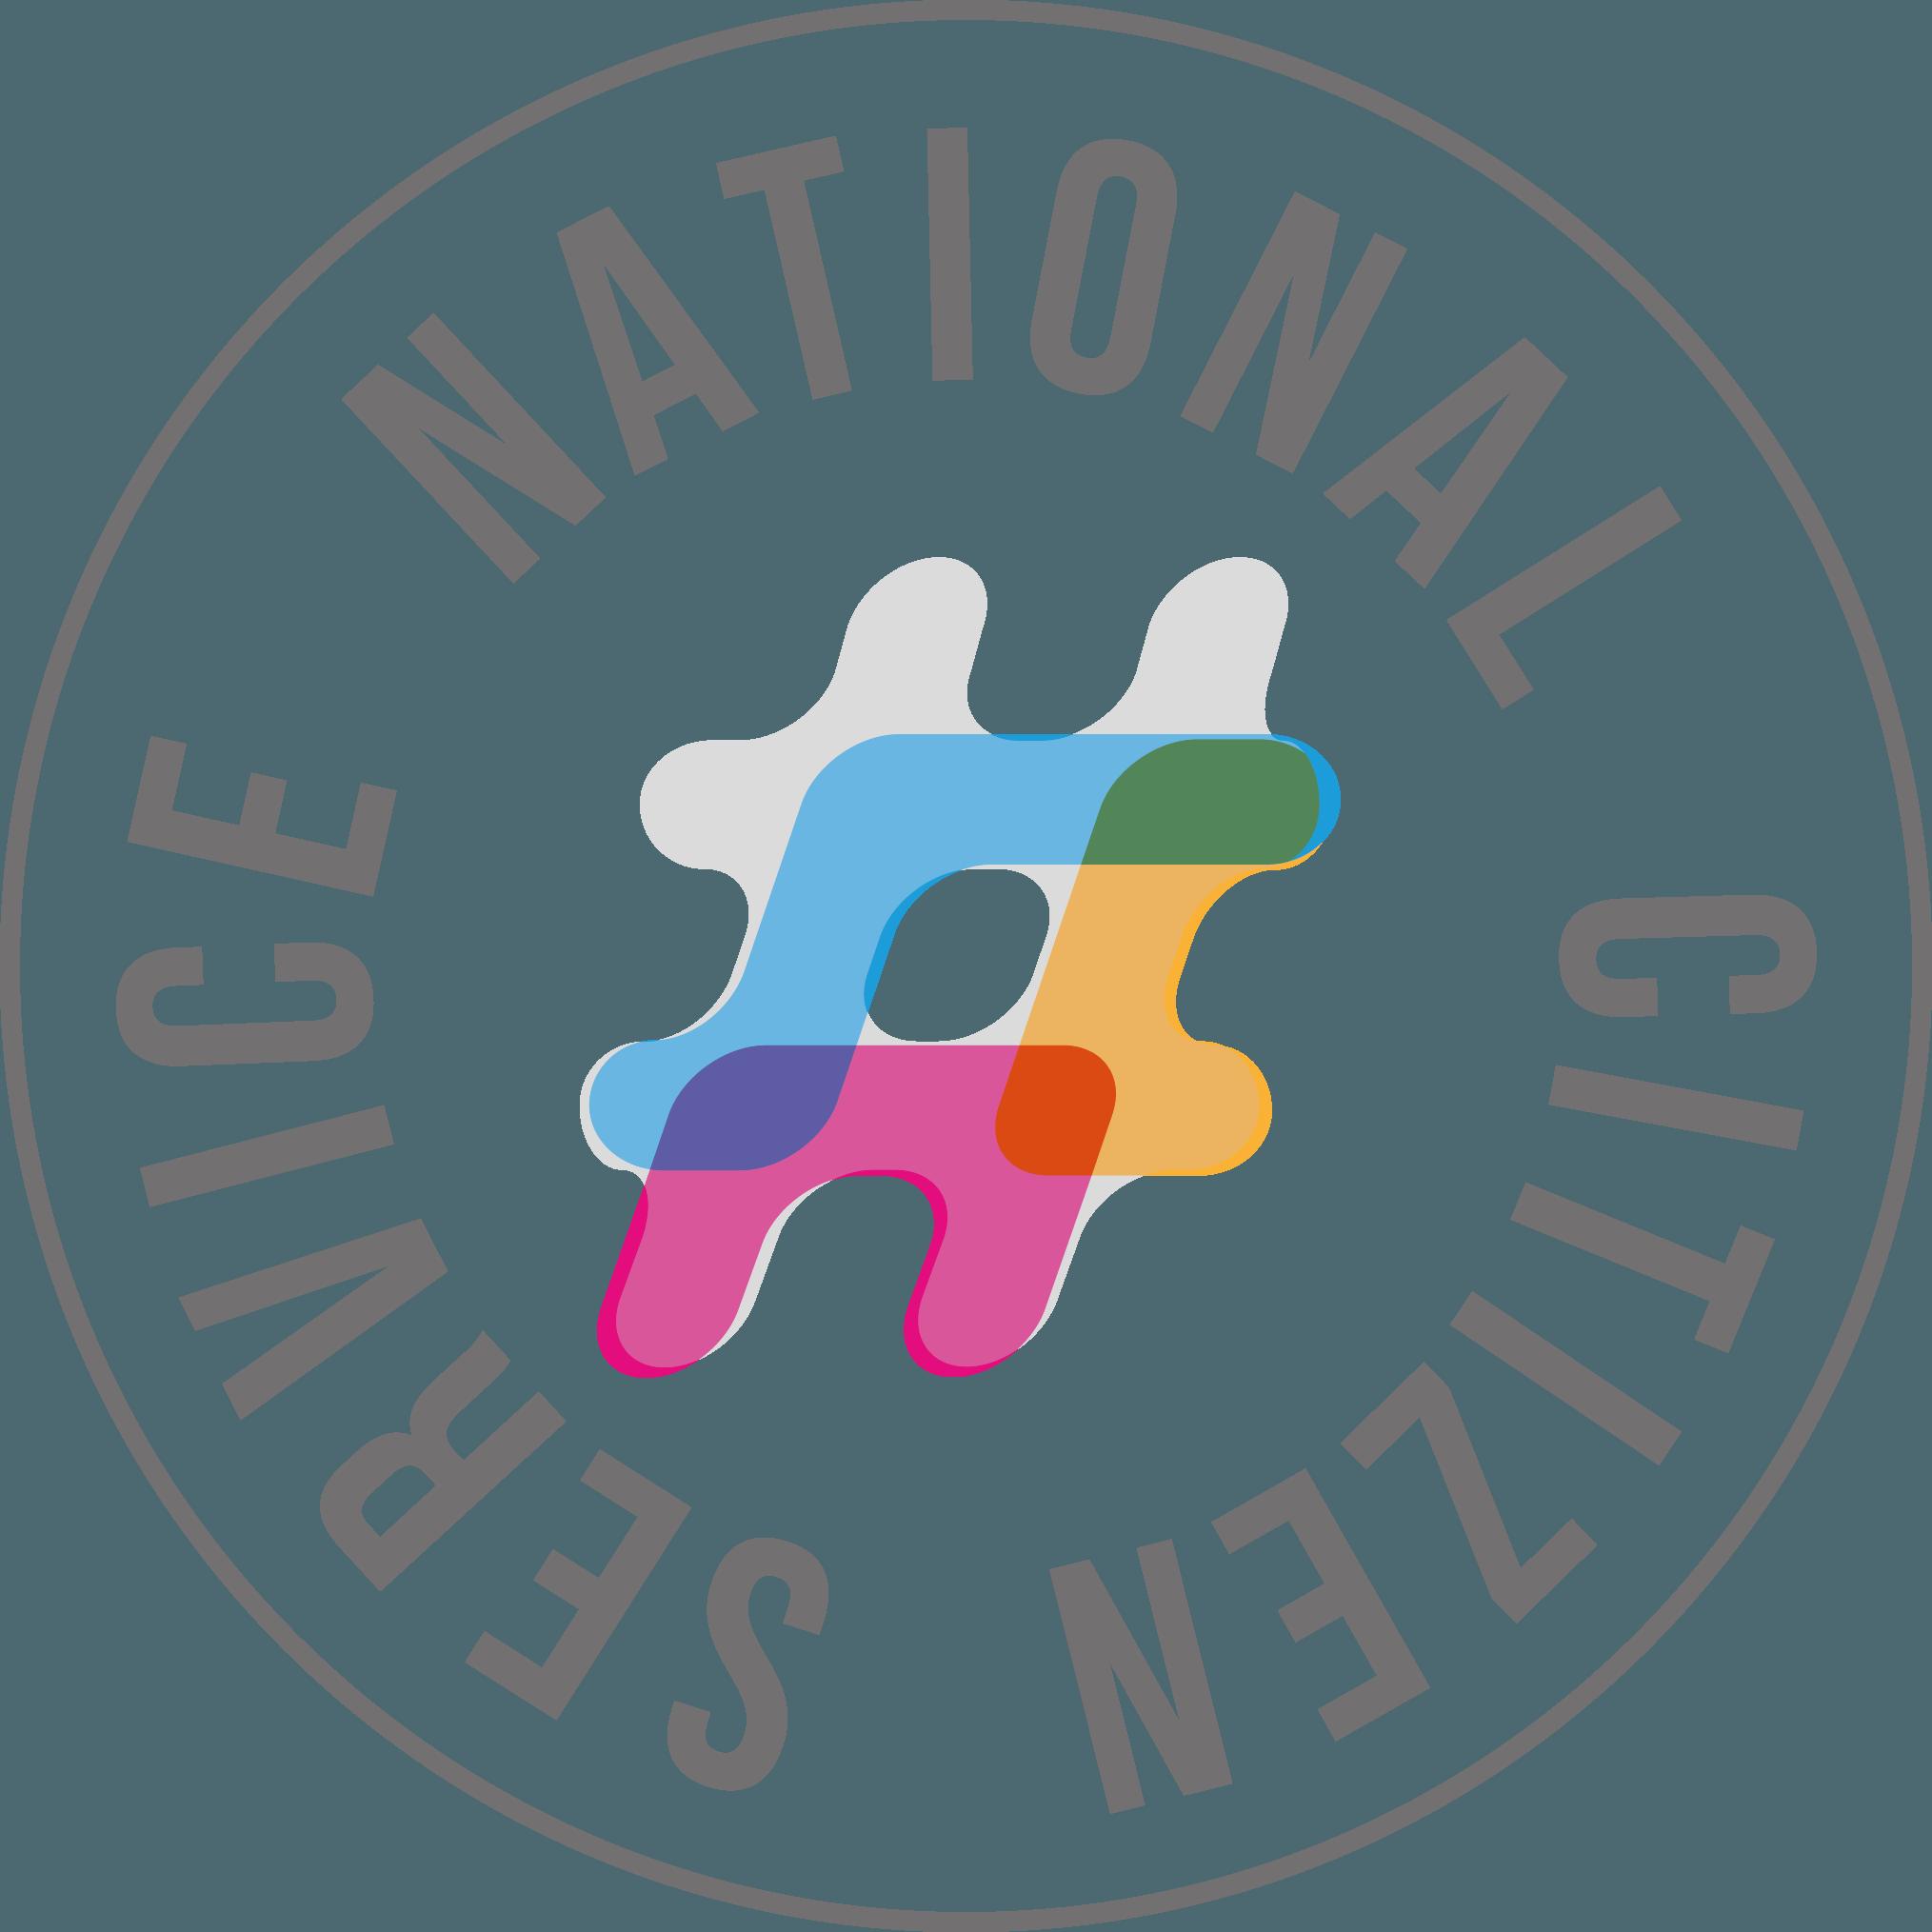 NCS Logo (National Citizen Service) png